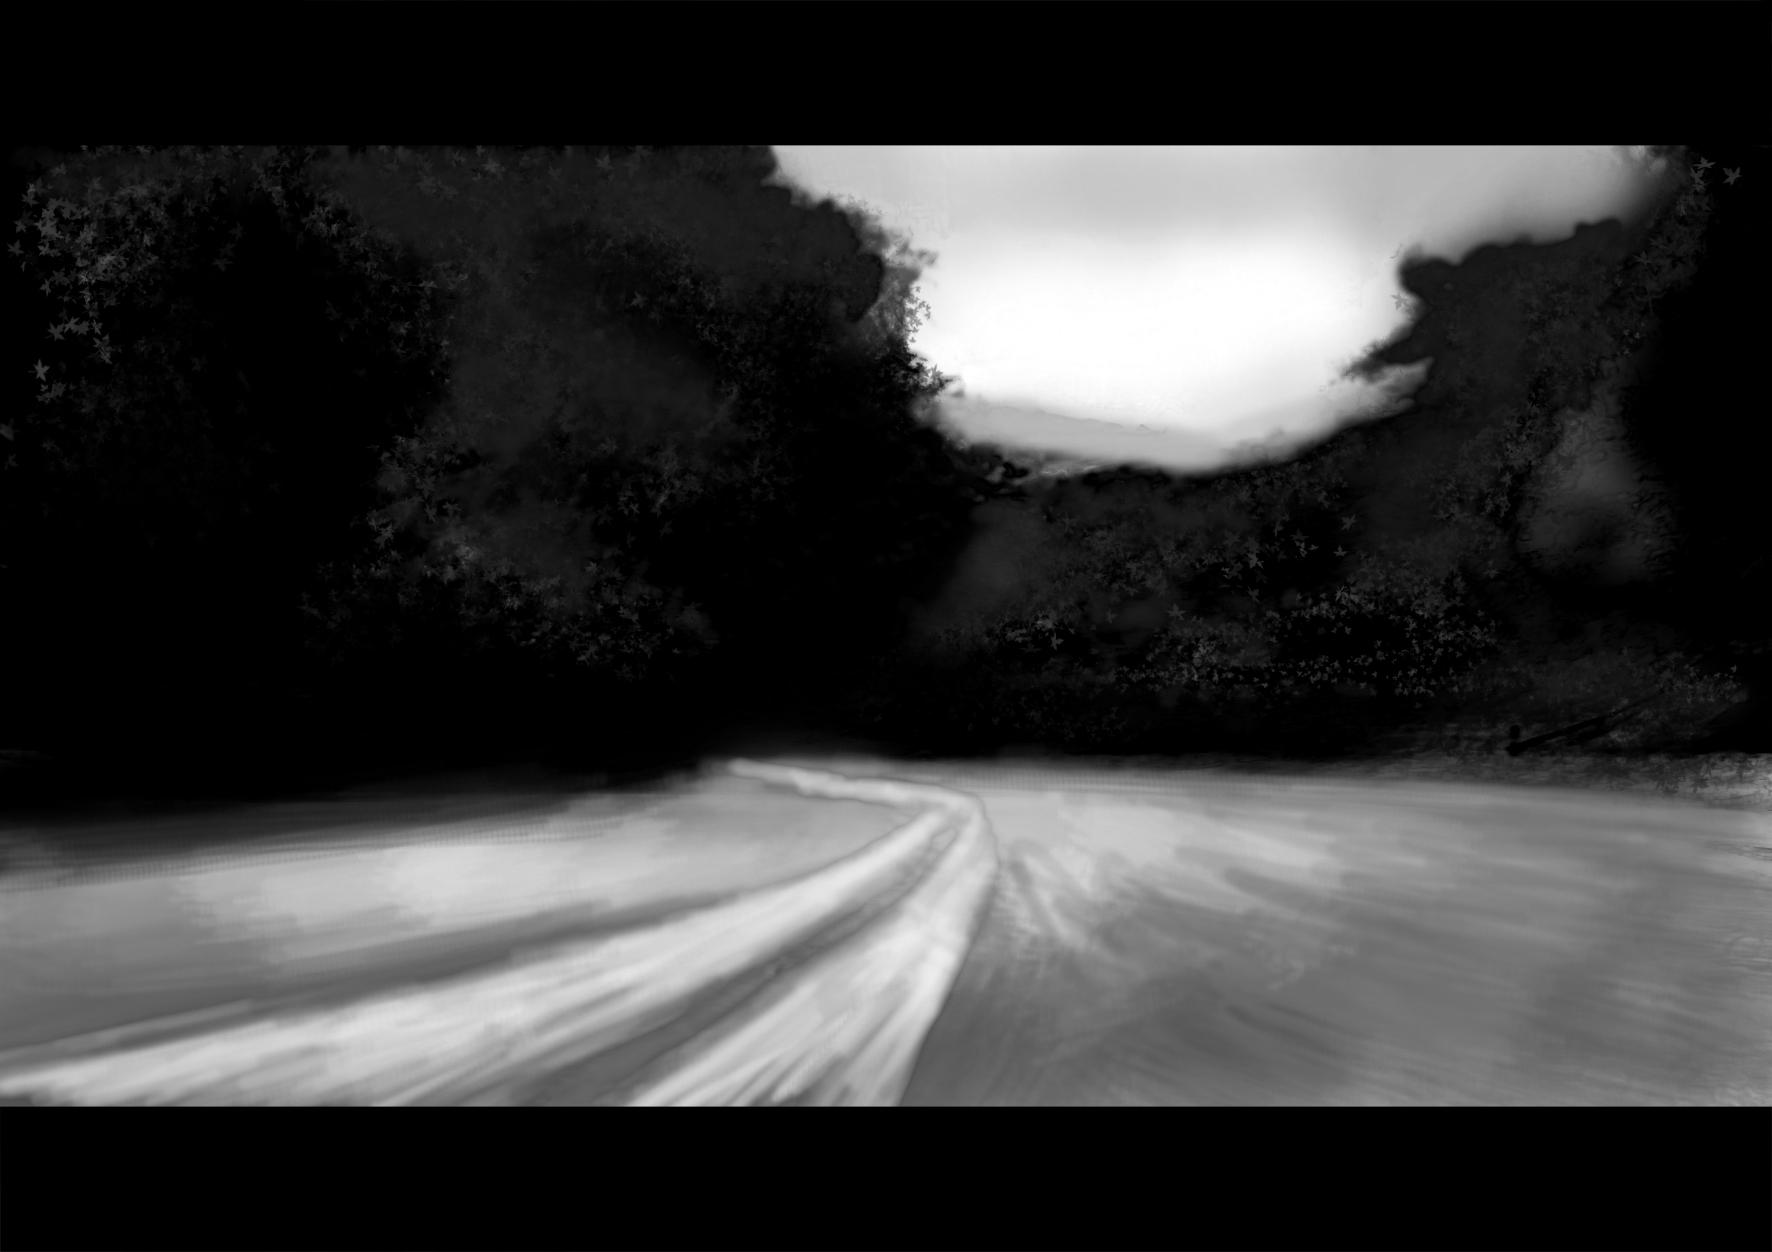 Subjetivas-002-ByN